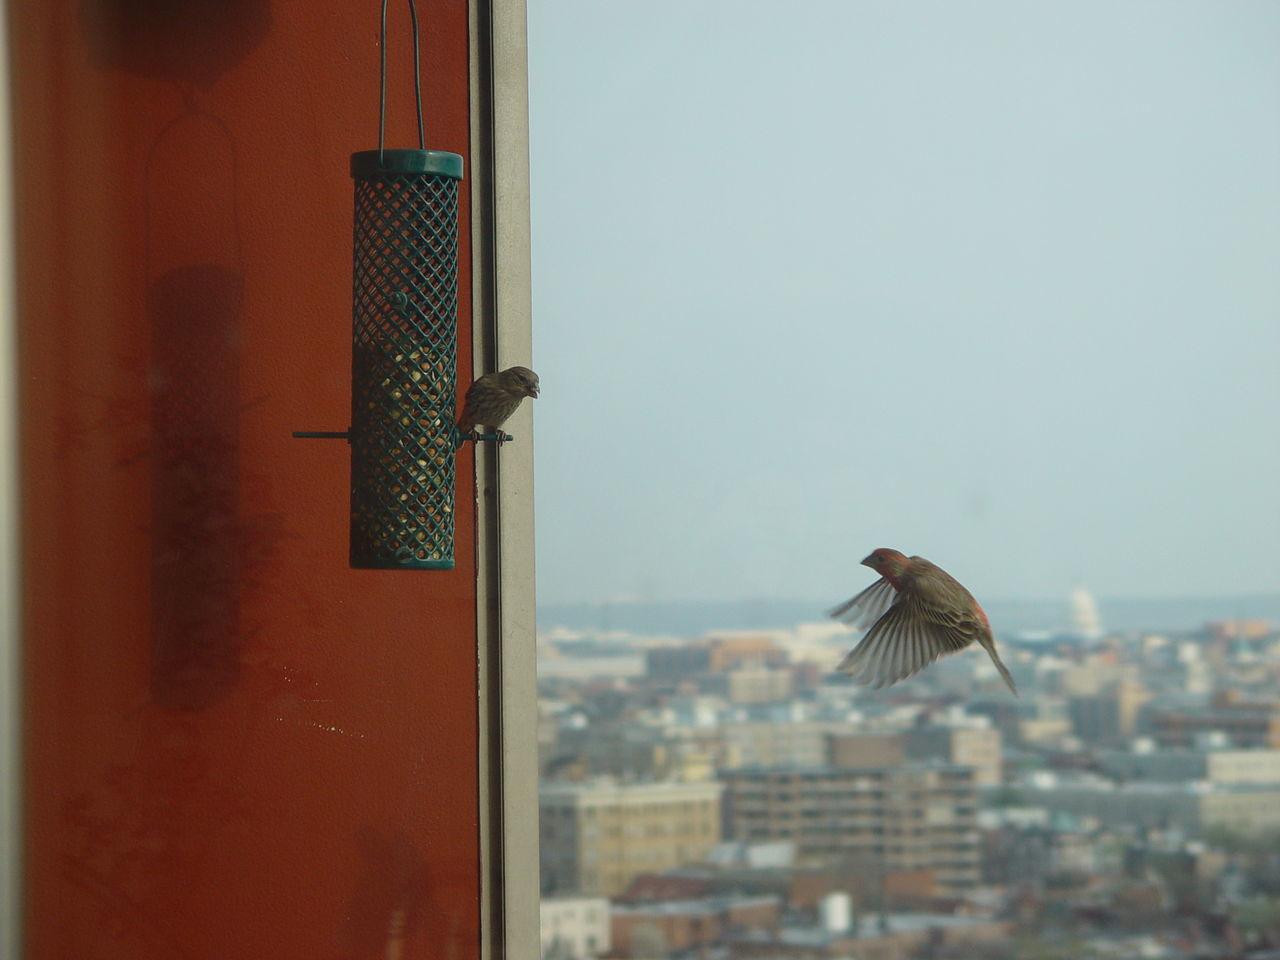 Birds Against Cityscape